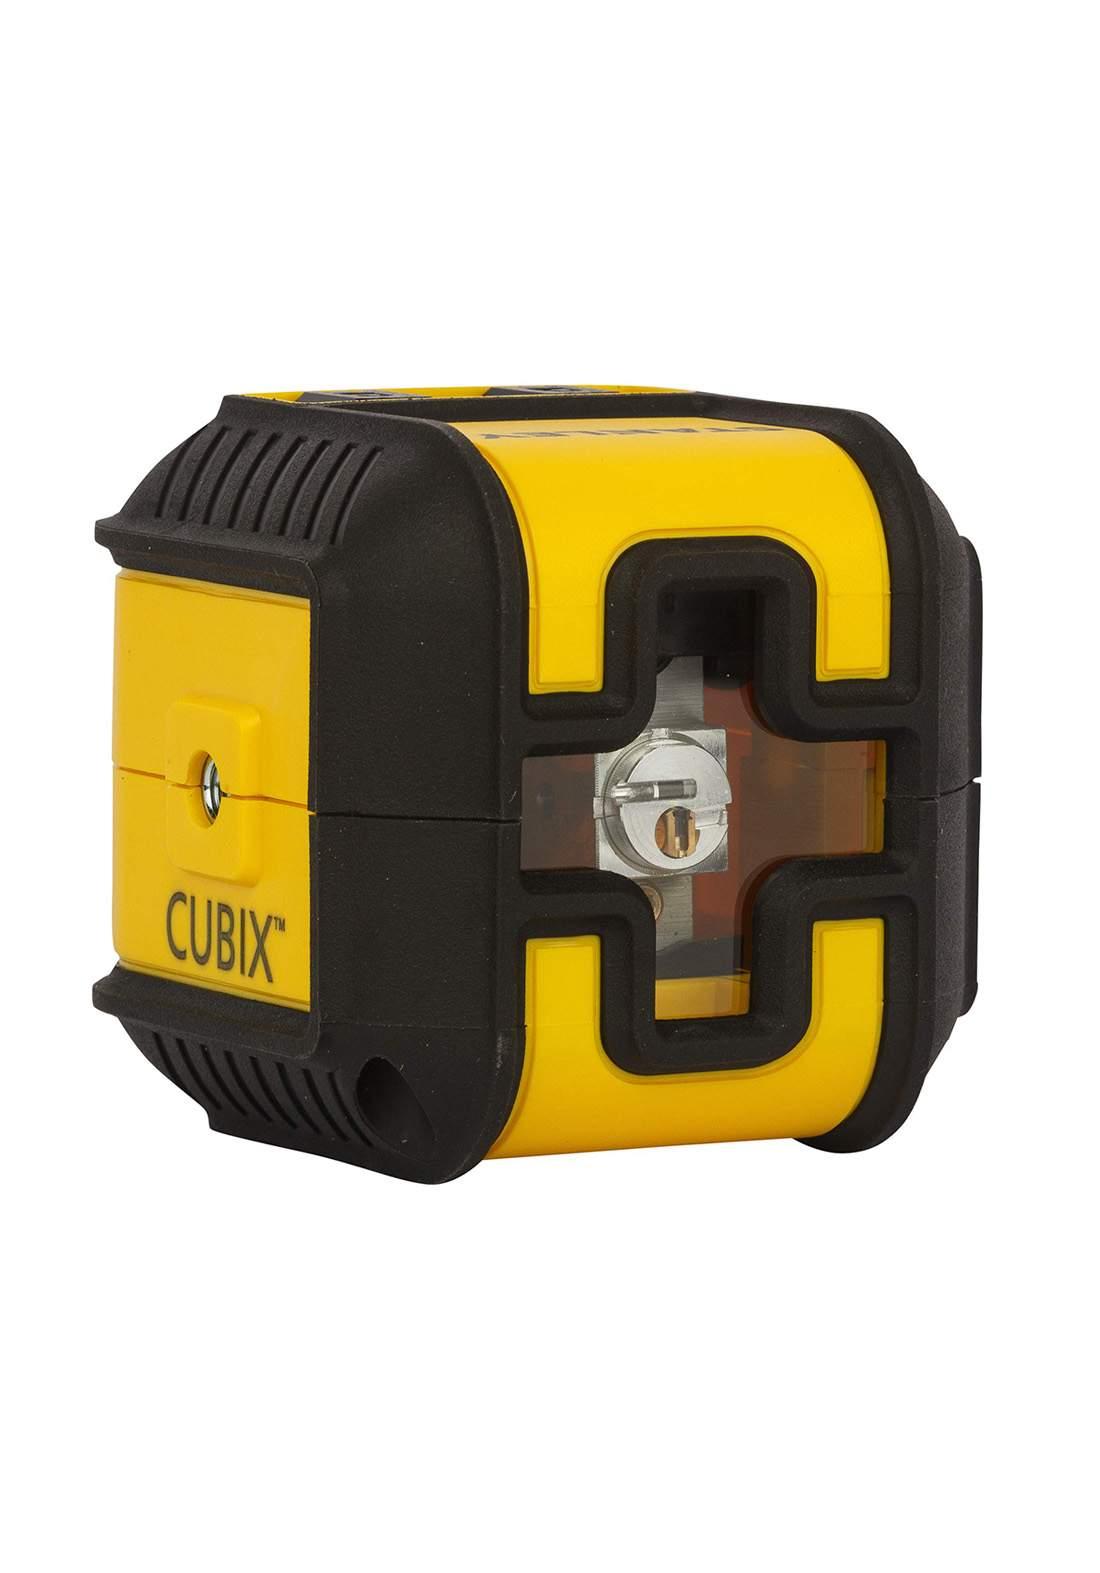 Stanley STHT77498-1 CUBIX RED BEAM CROSS LINE LASER LEVEL جهاز قياس وتسوية